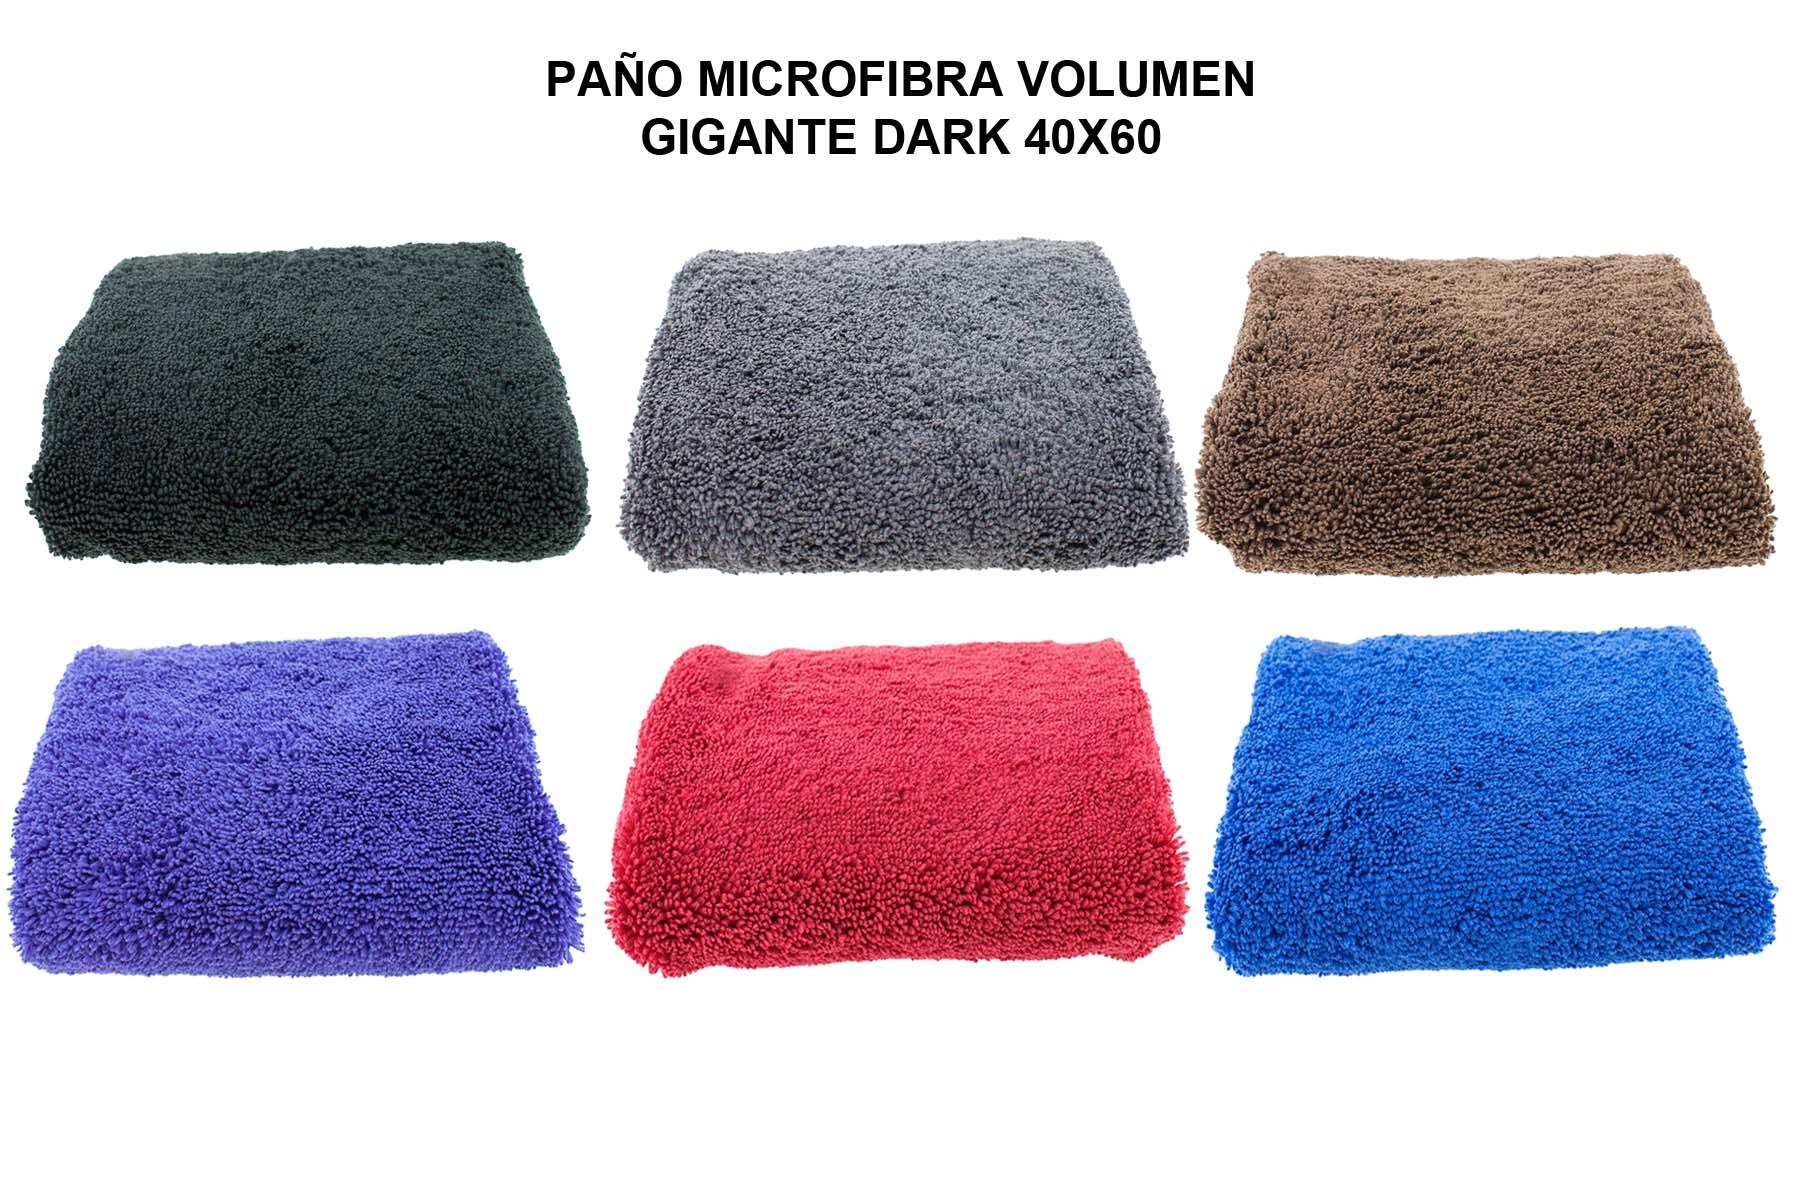 PAÑO MICROFIBRA VOLUMEN GIGANTE DARK 40X60